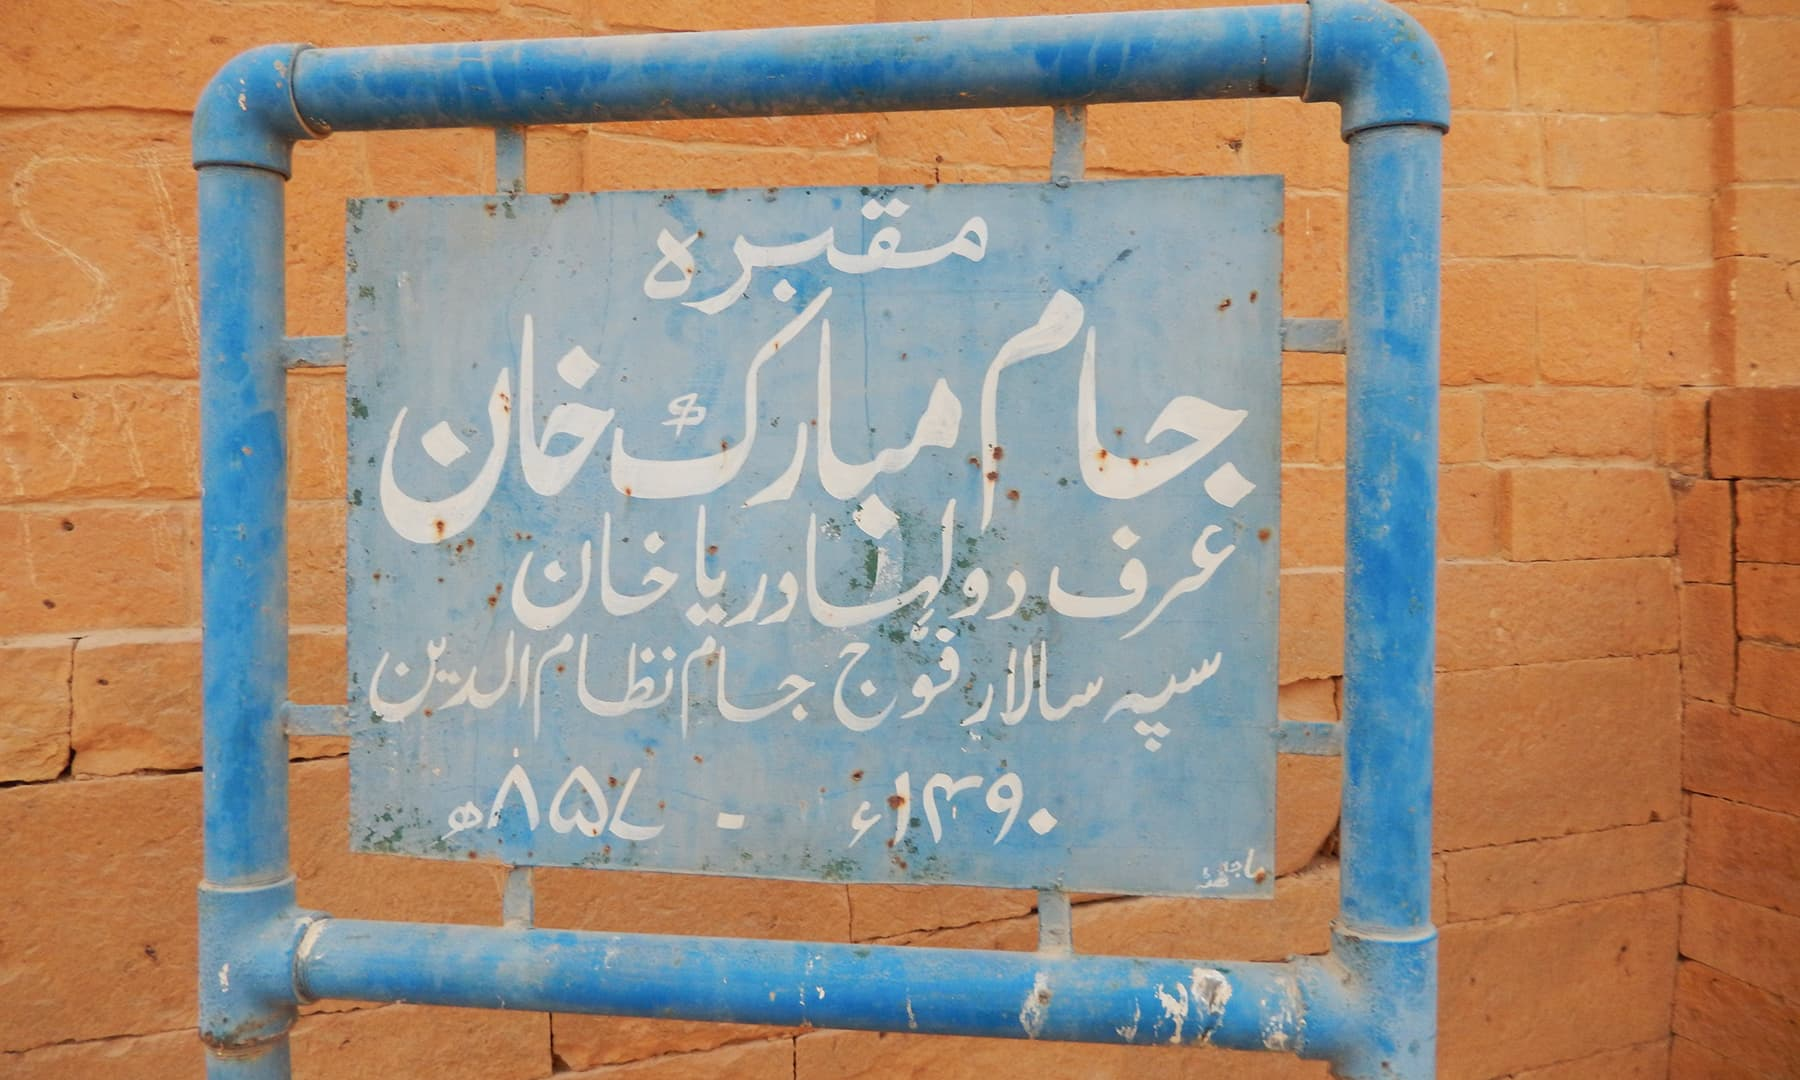 مقبرہ اعظم خان— تصویر ابوبکر شیخ